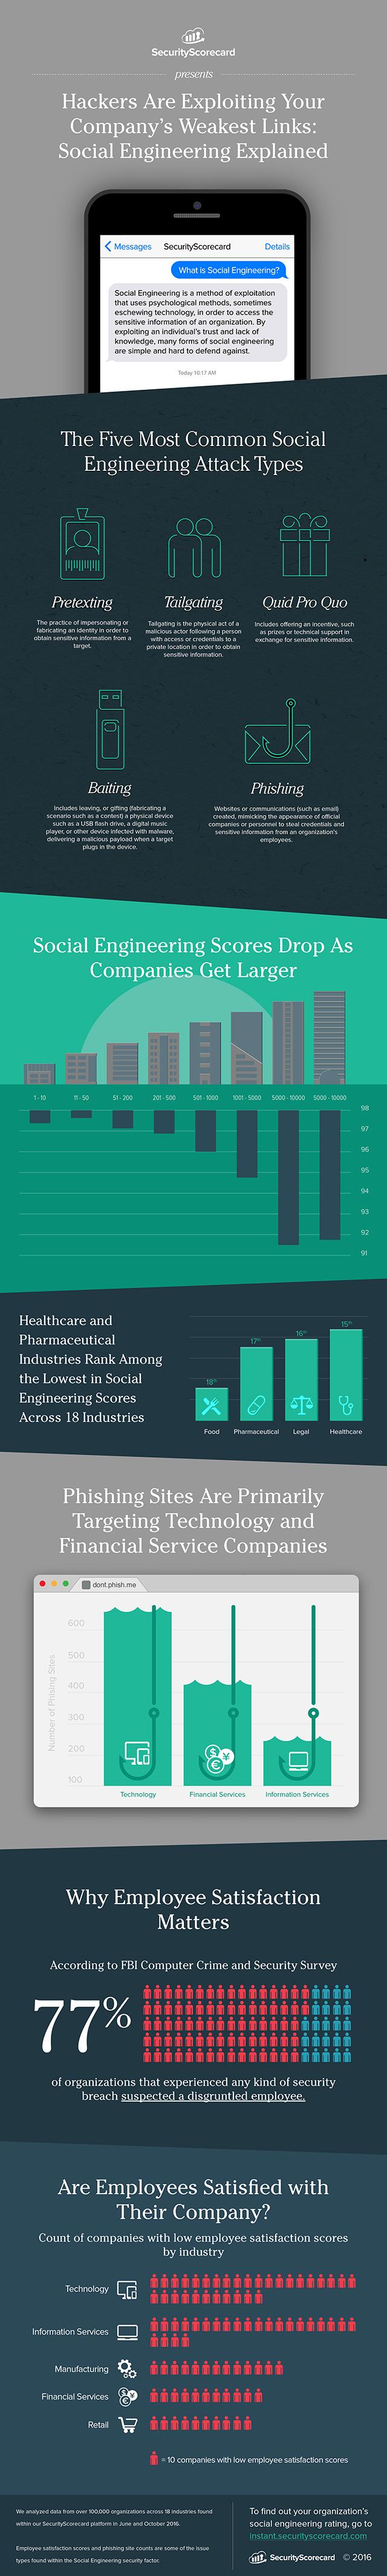 ssc-socialengineering-infographic-c04